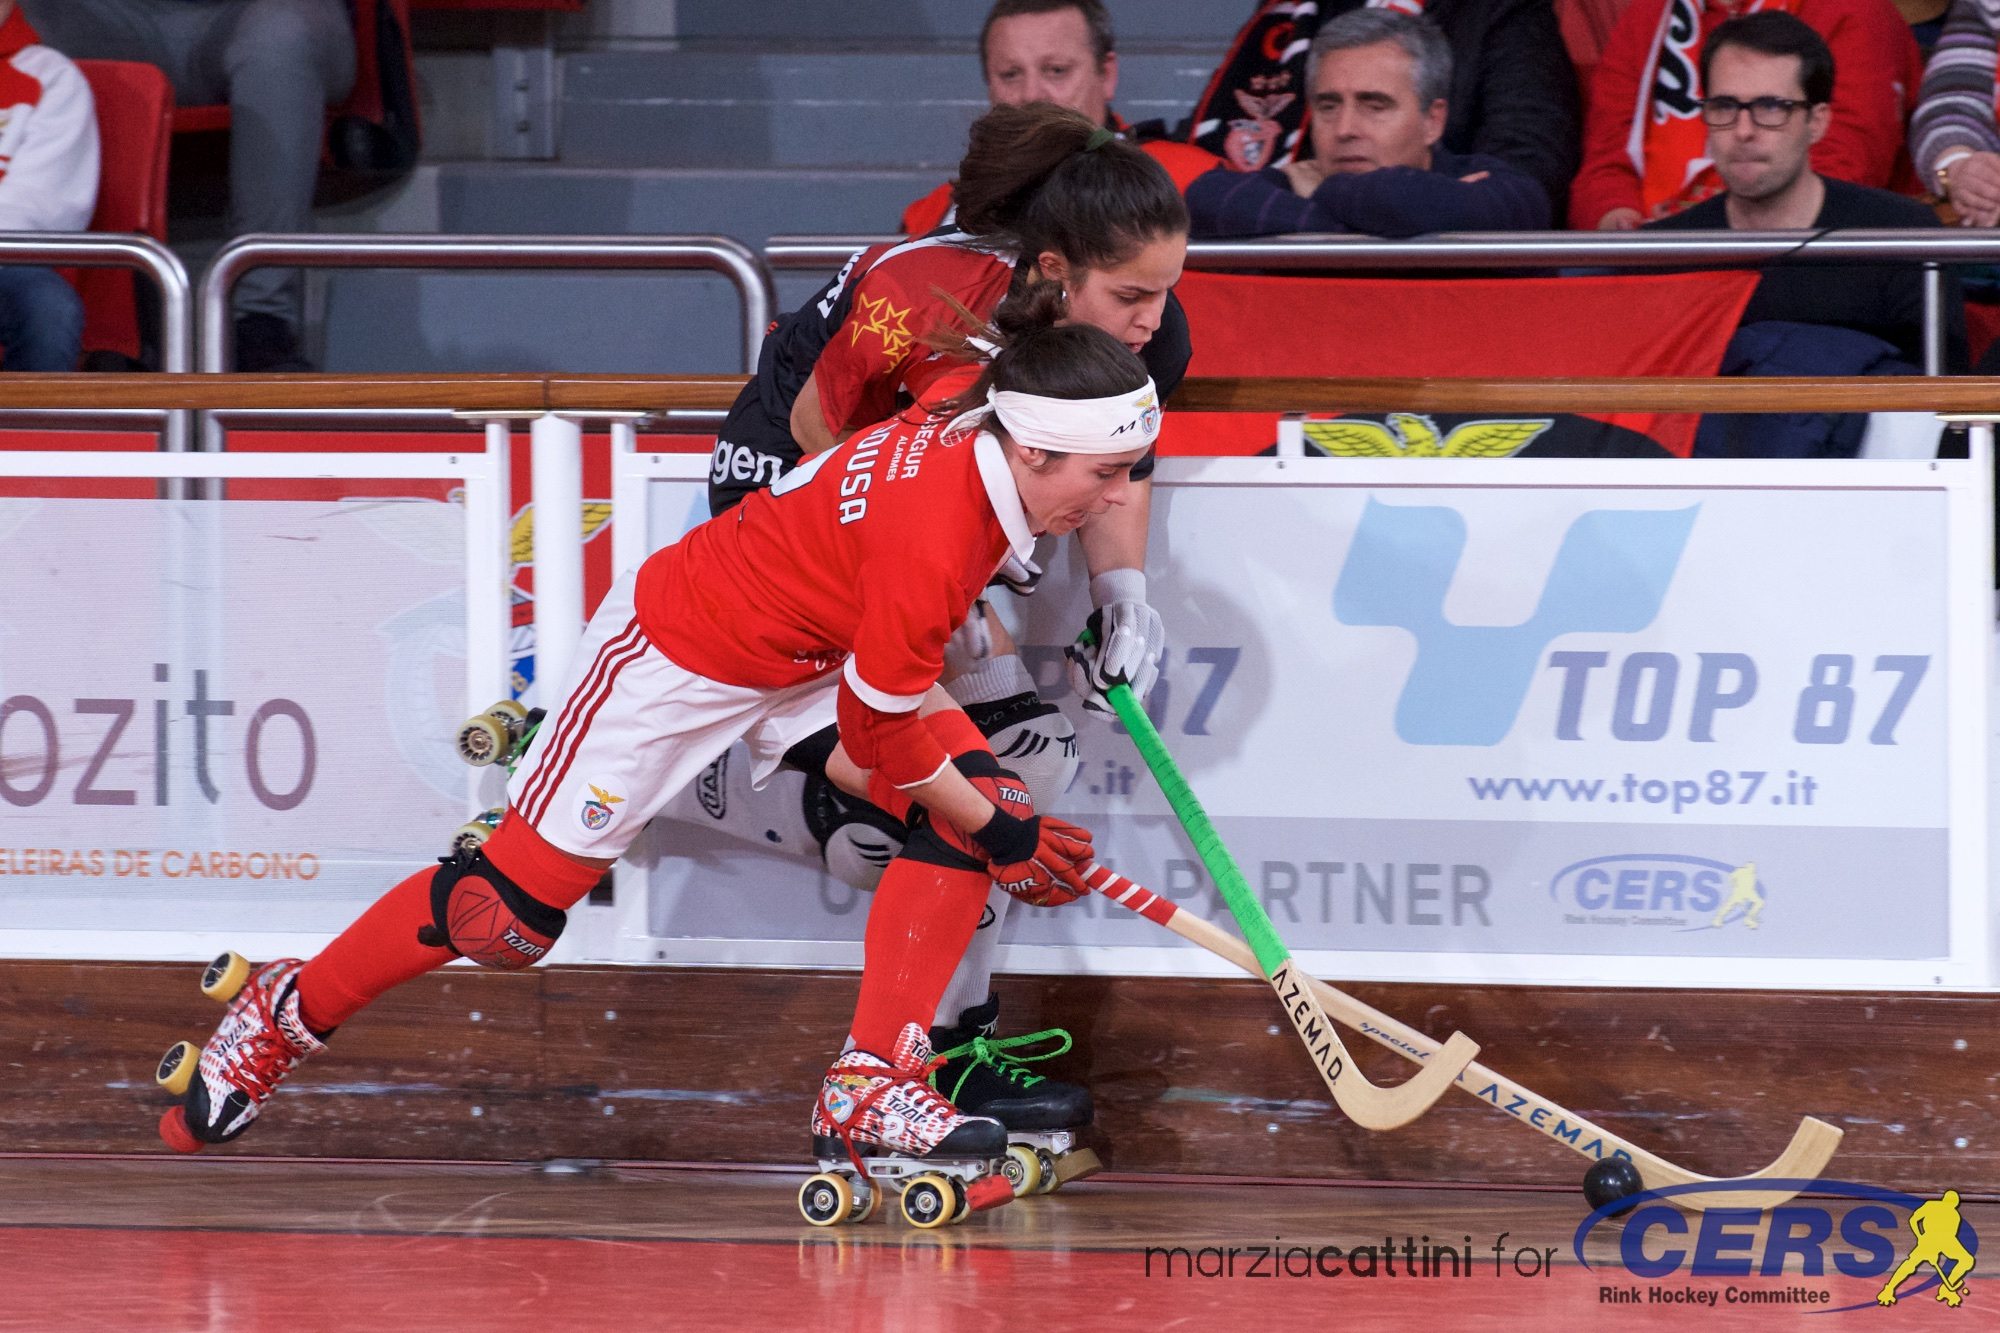 18-03-18_Benfica-Gijon06